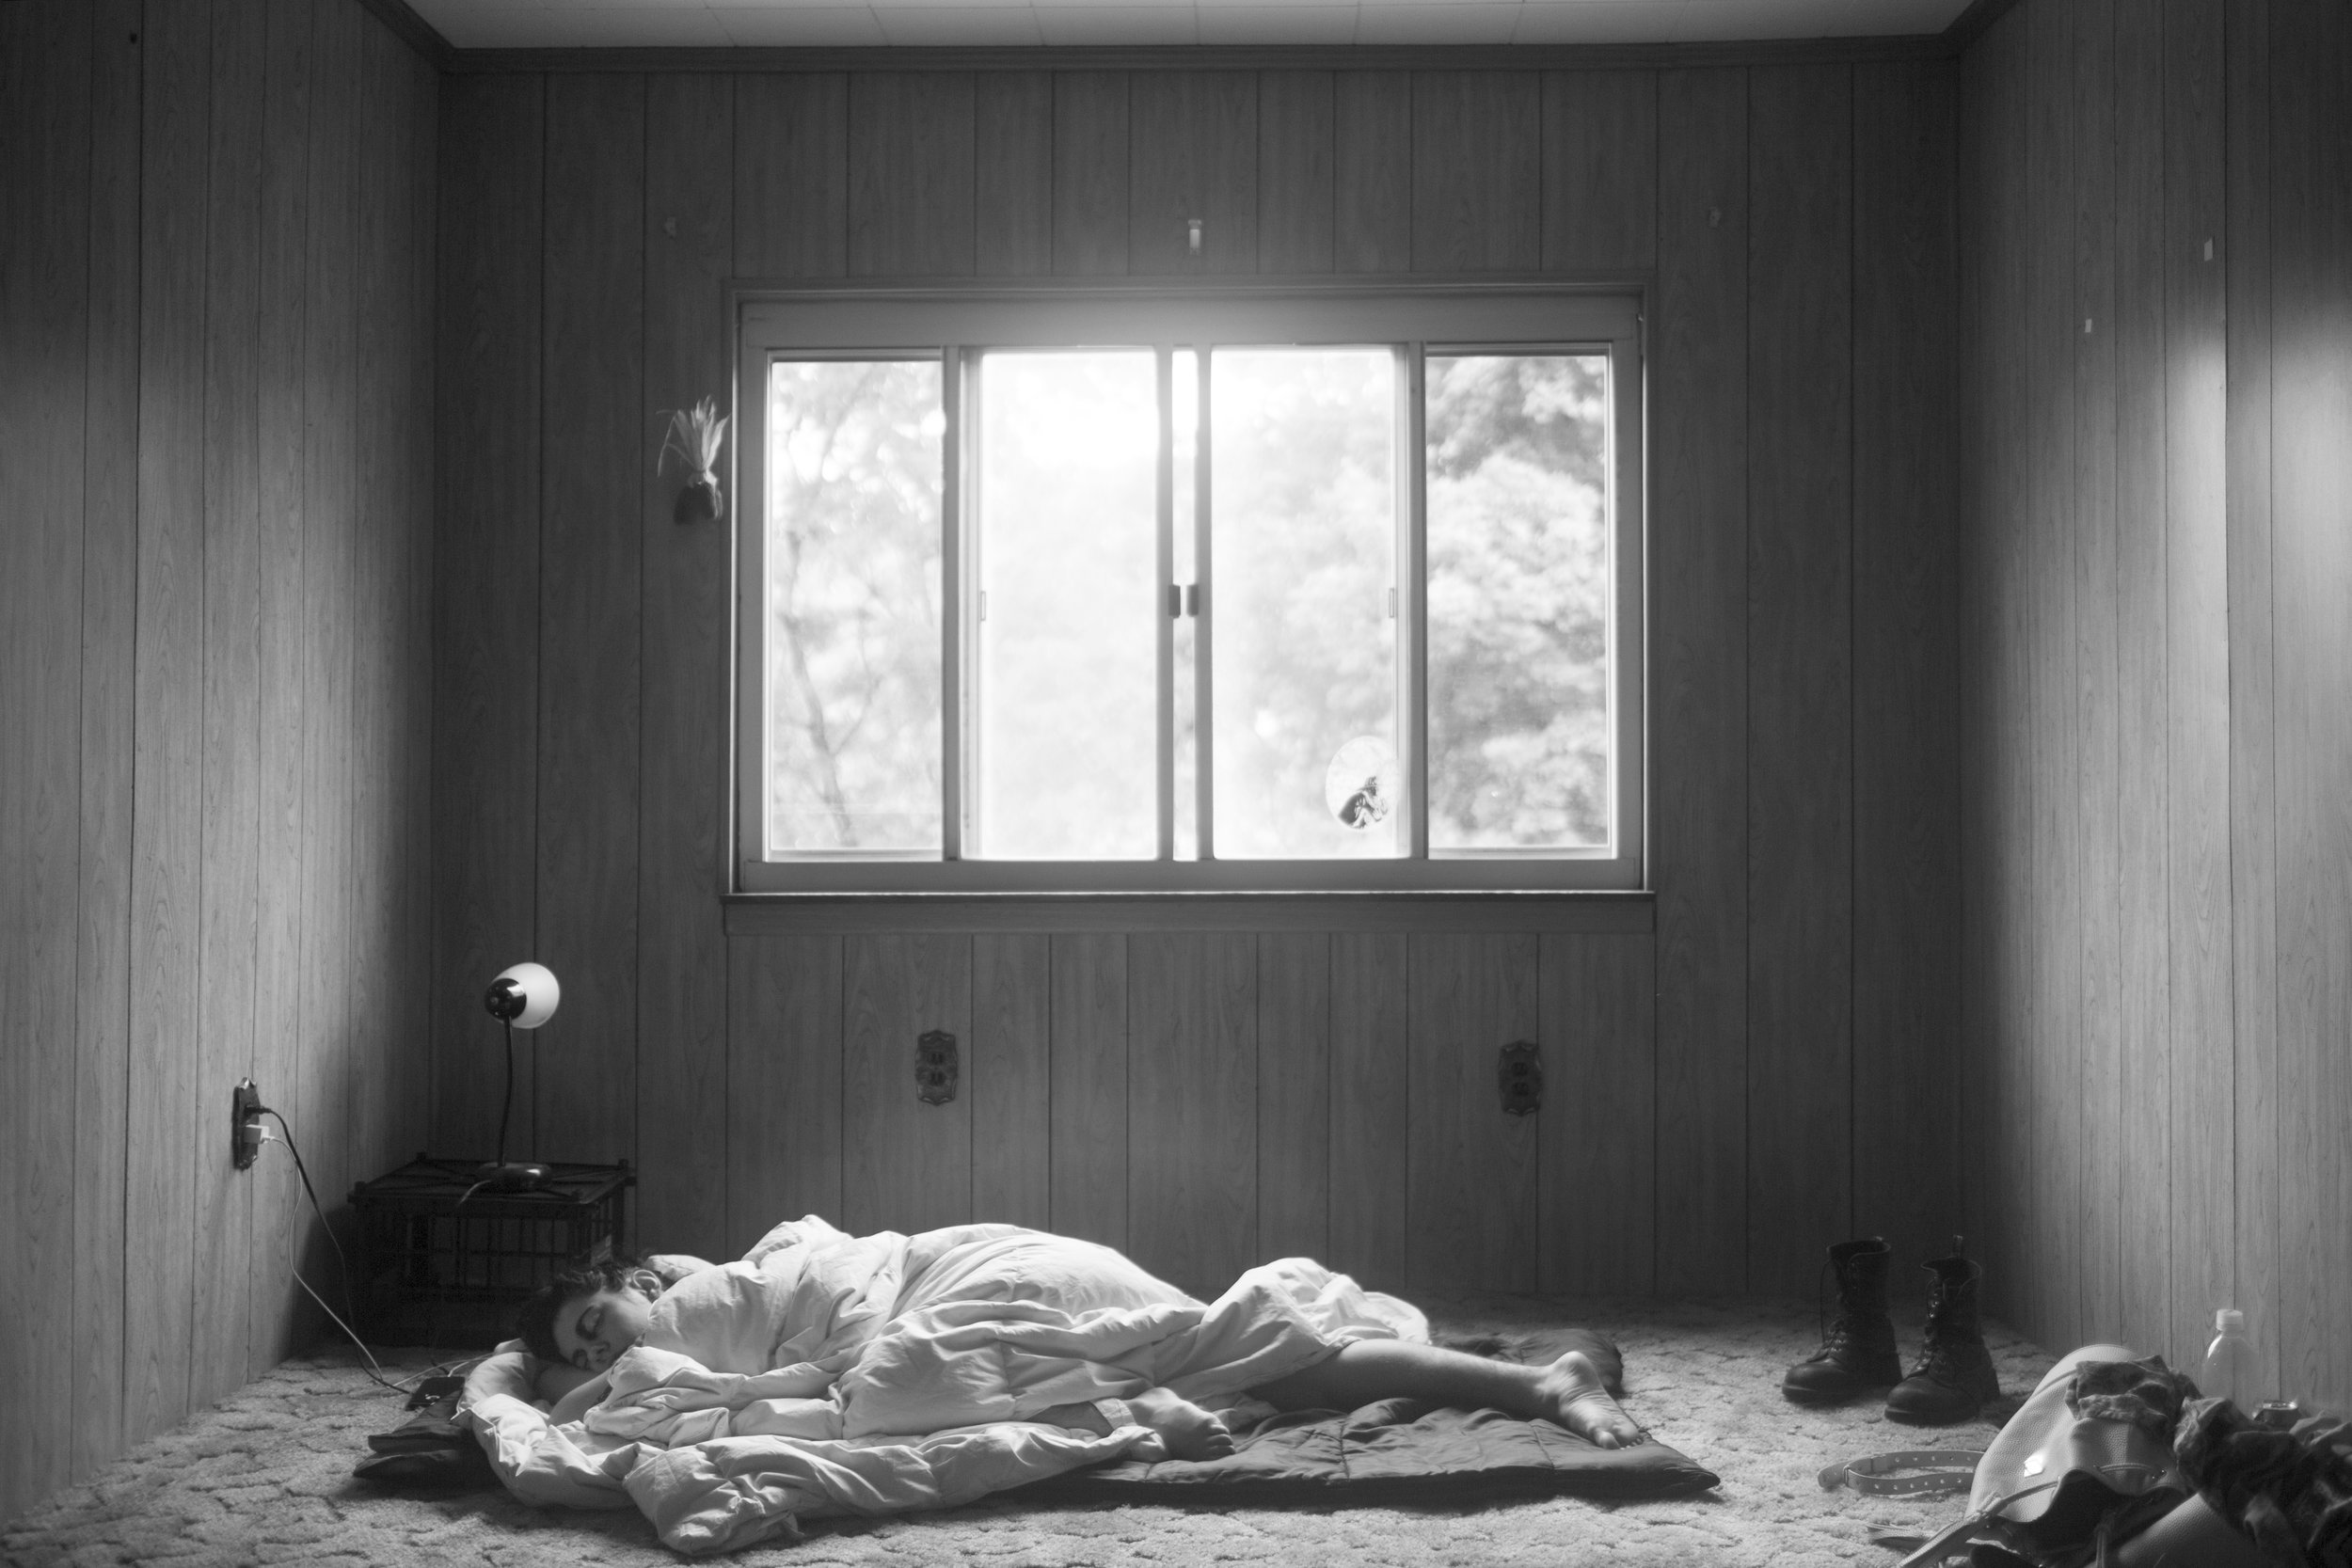 Farra Sleeping, Pittsburgh, 2016